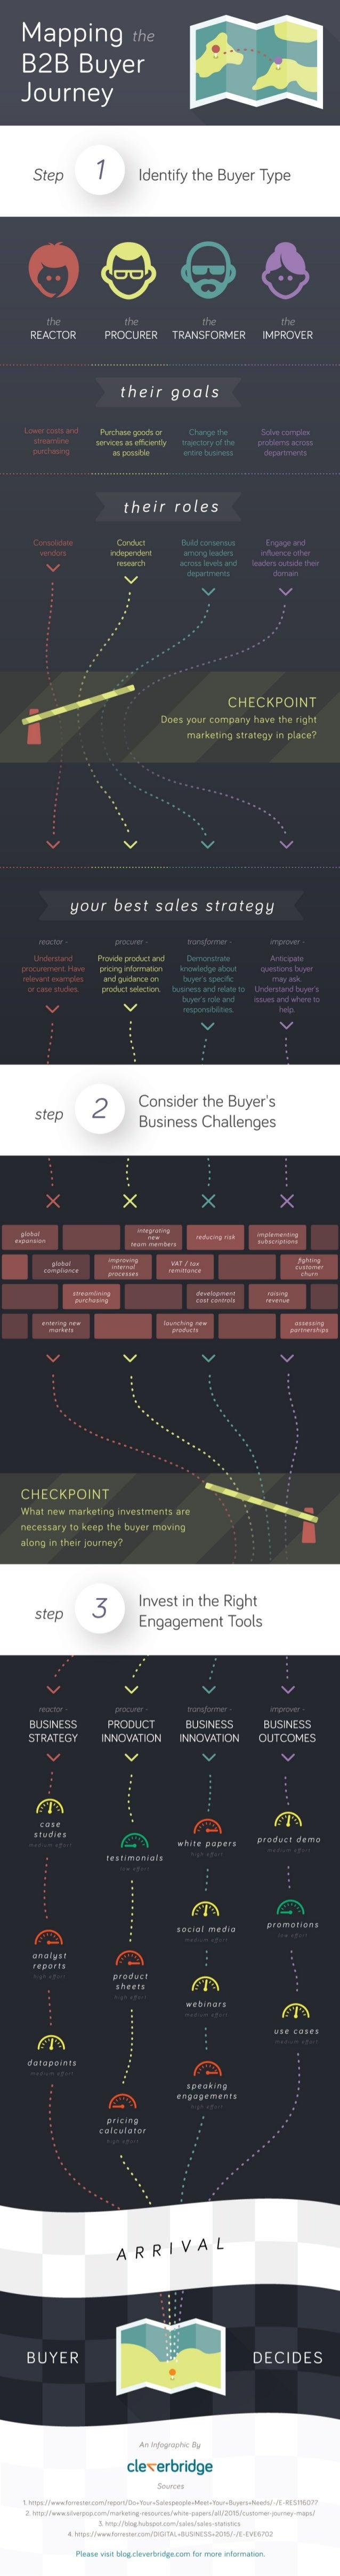 Mapping the B2B Buyer '  Journey        ii_ i_ i_ I i II It?  lII. ll; T' hill?  IIITIJ  I i  REACTOR PROCURER TRANSFORMER...